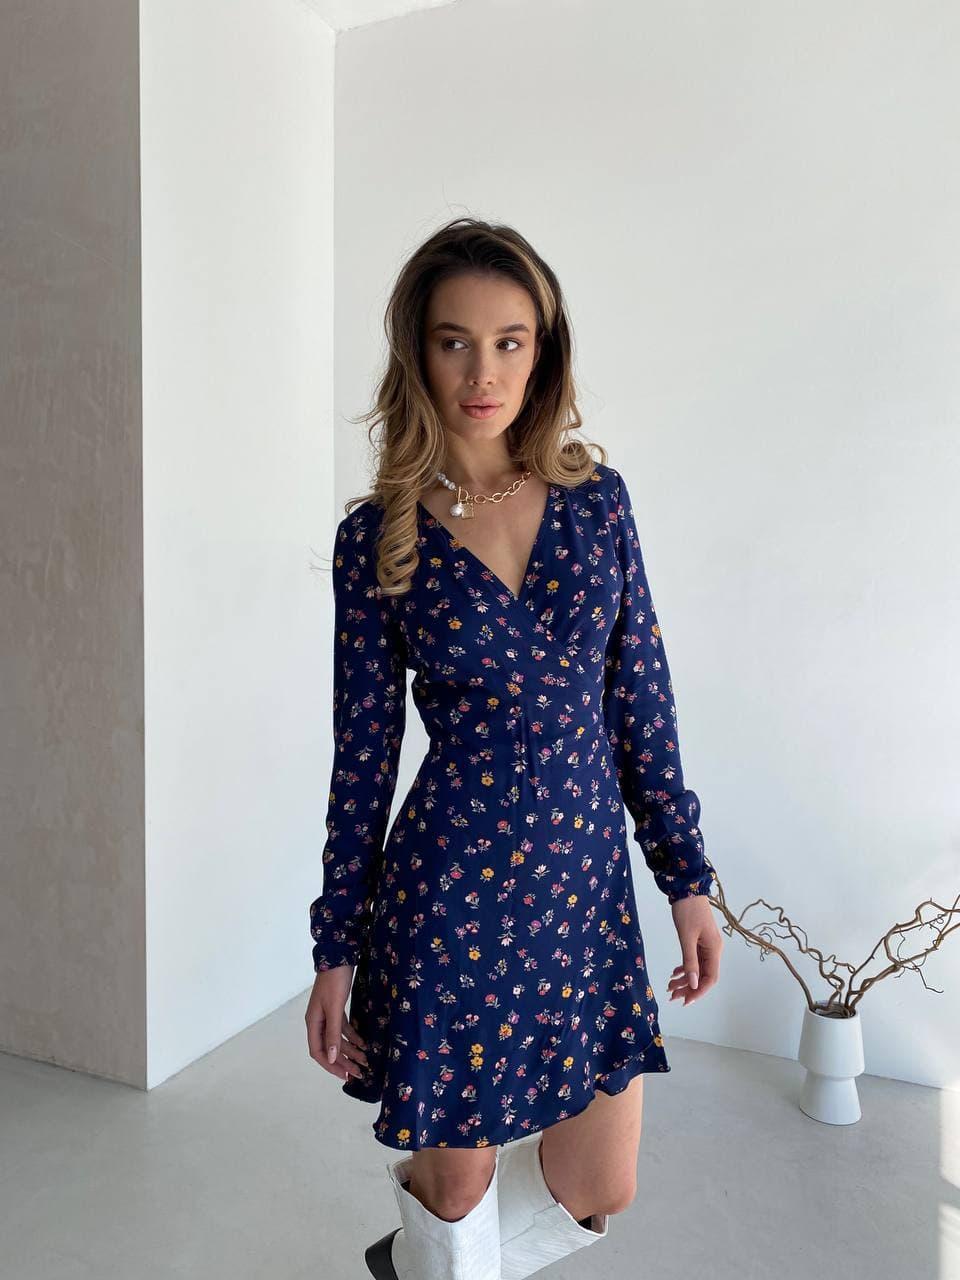 Цветочное платье мини на запах синее